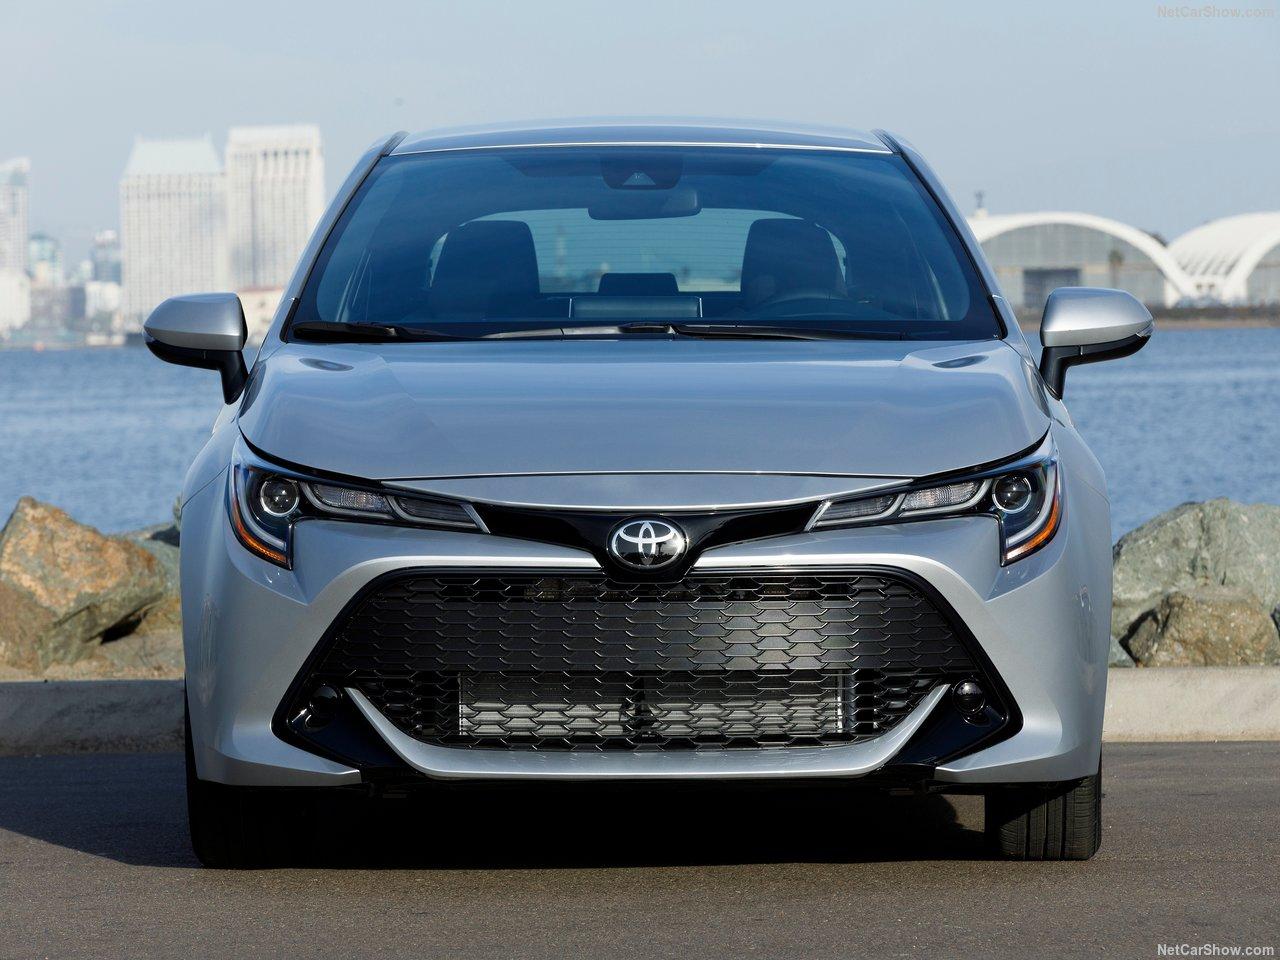 Toyota-Corolla_Hatchback-2019-1280-1e.jpg